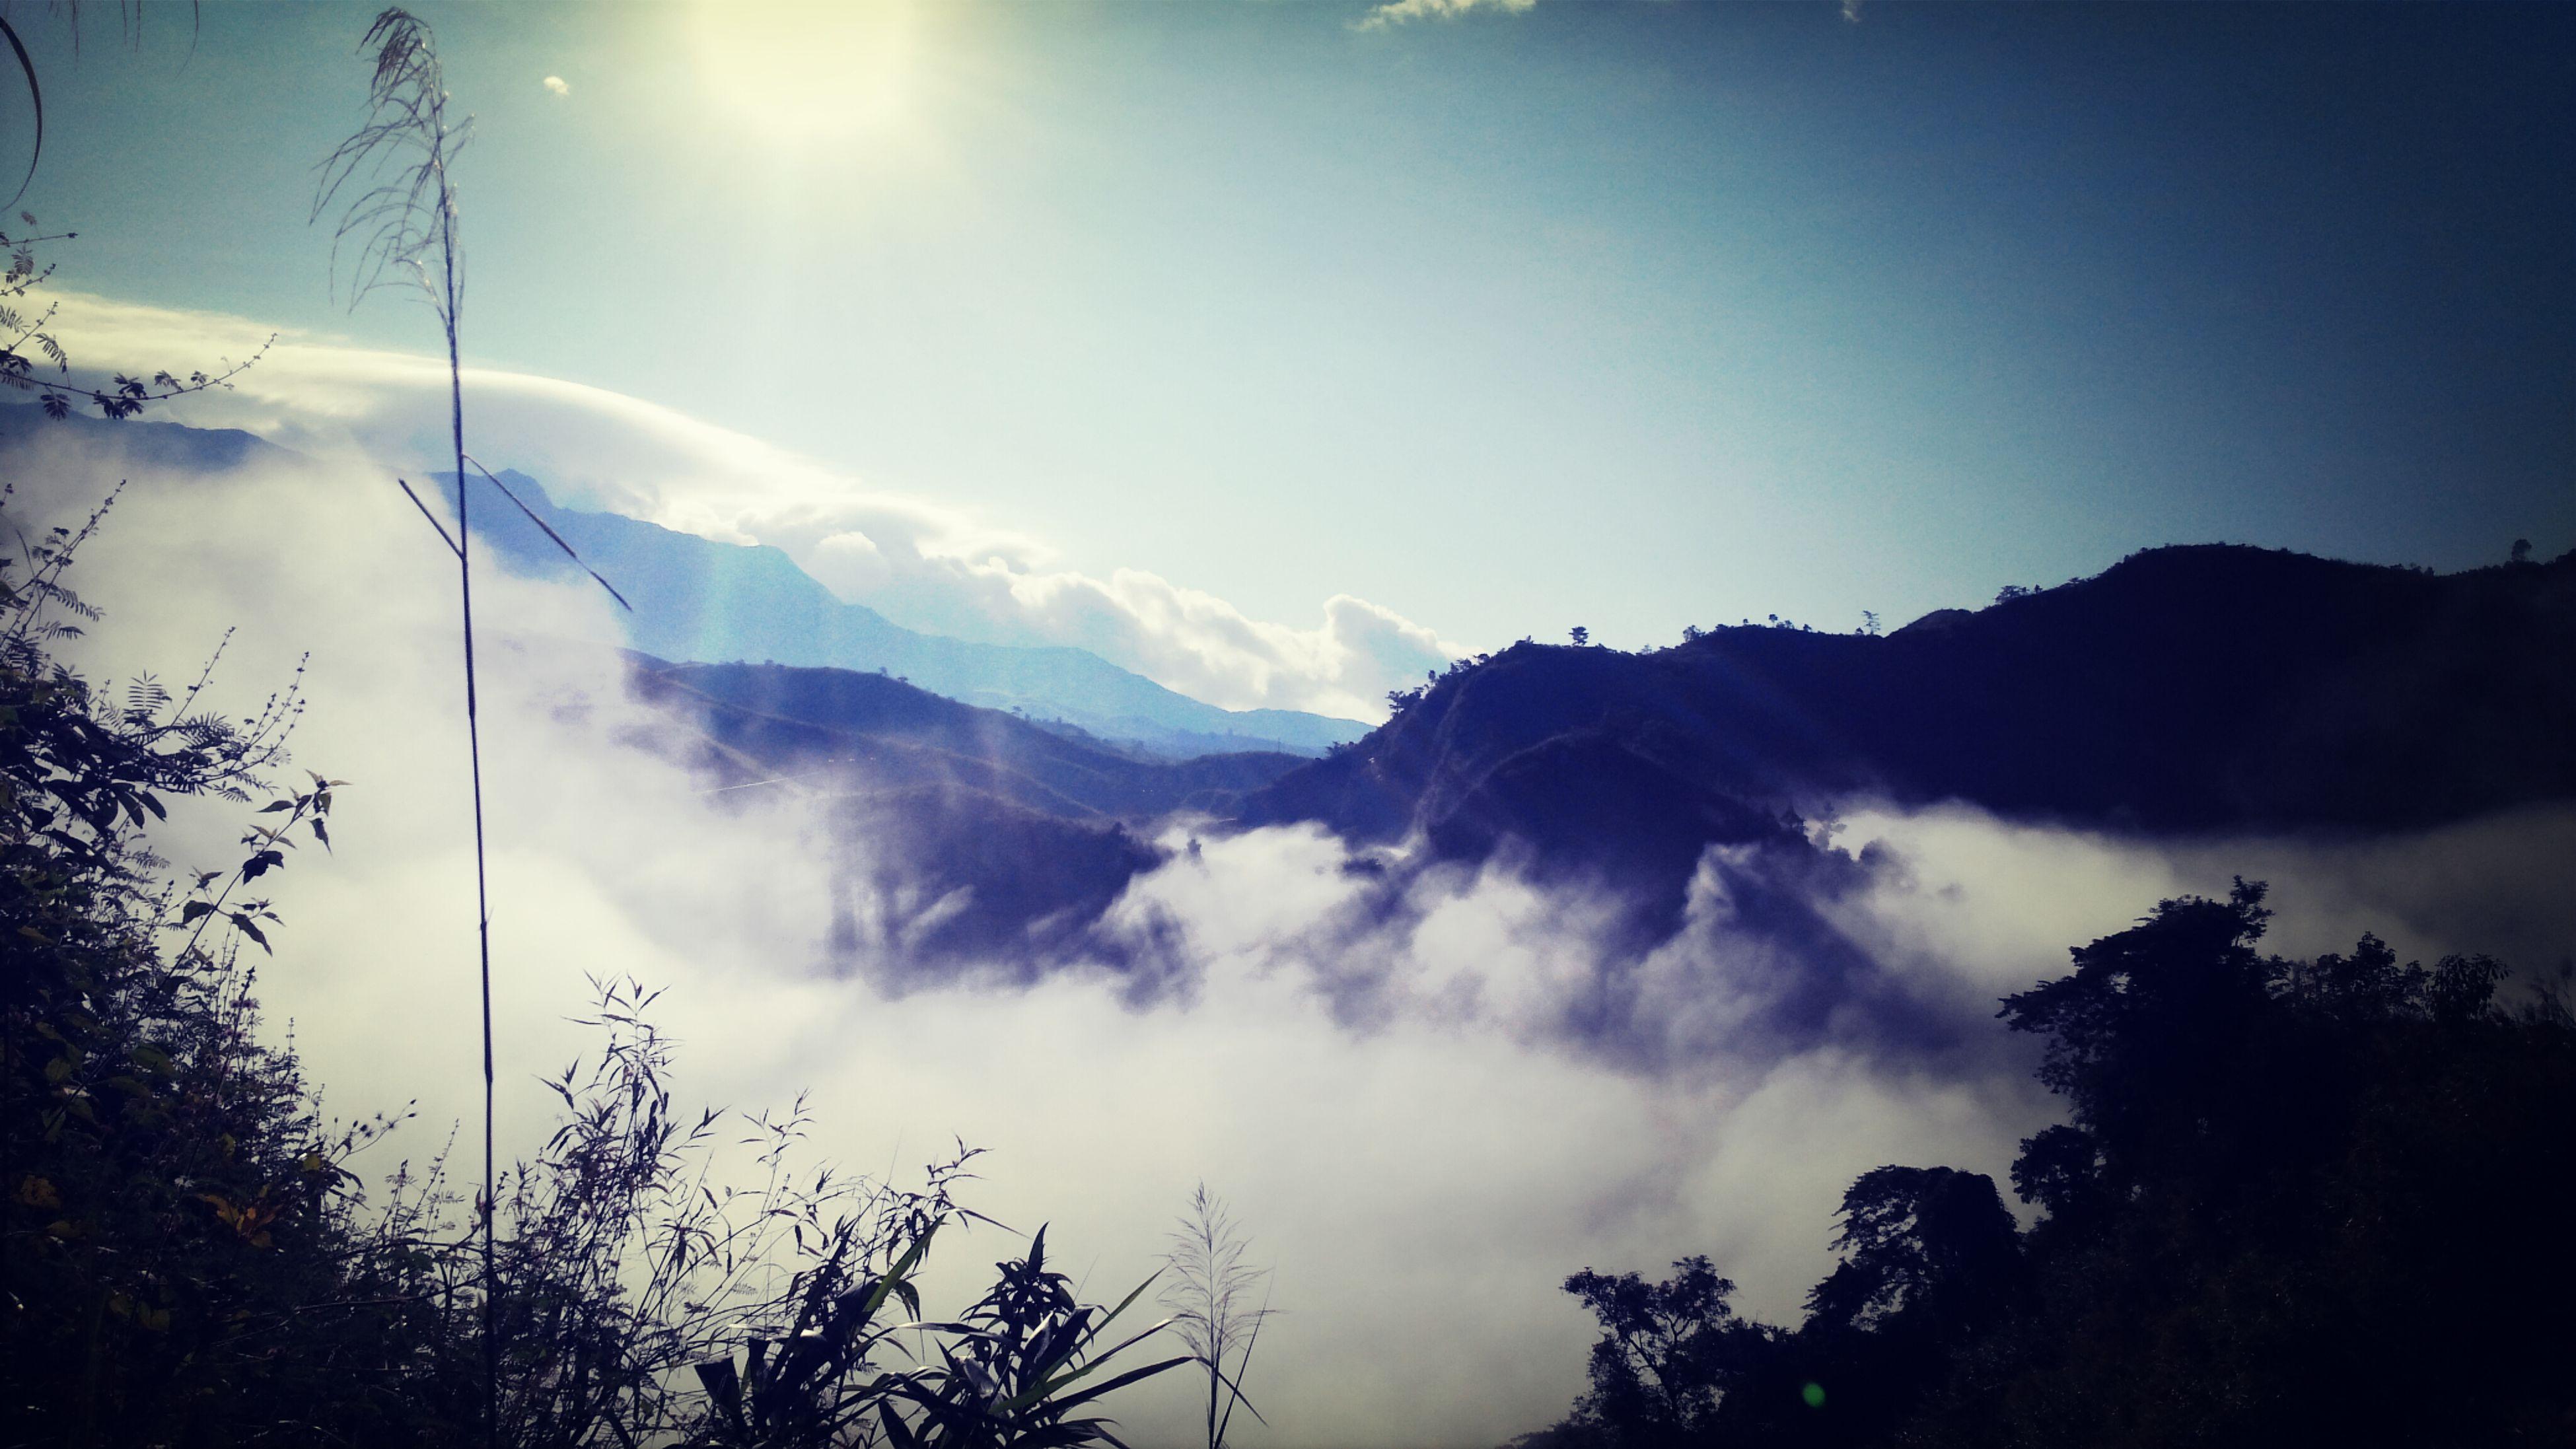 mountain, tranquility, tranquil scene, scenics, beauty in nature, sun, sunbeam, tree, sky, mountain range, nature, sunlight, landscape, lens flare, idyllic, low angle view, cloud - sky, non-urban scene, silhouette, no people